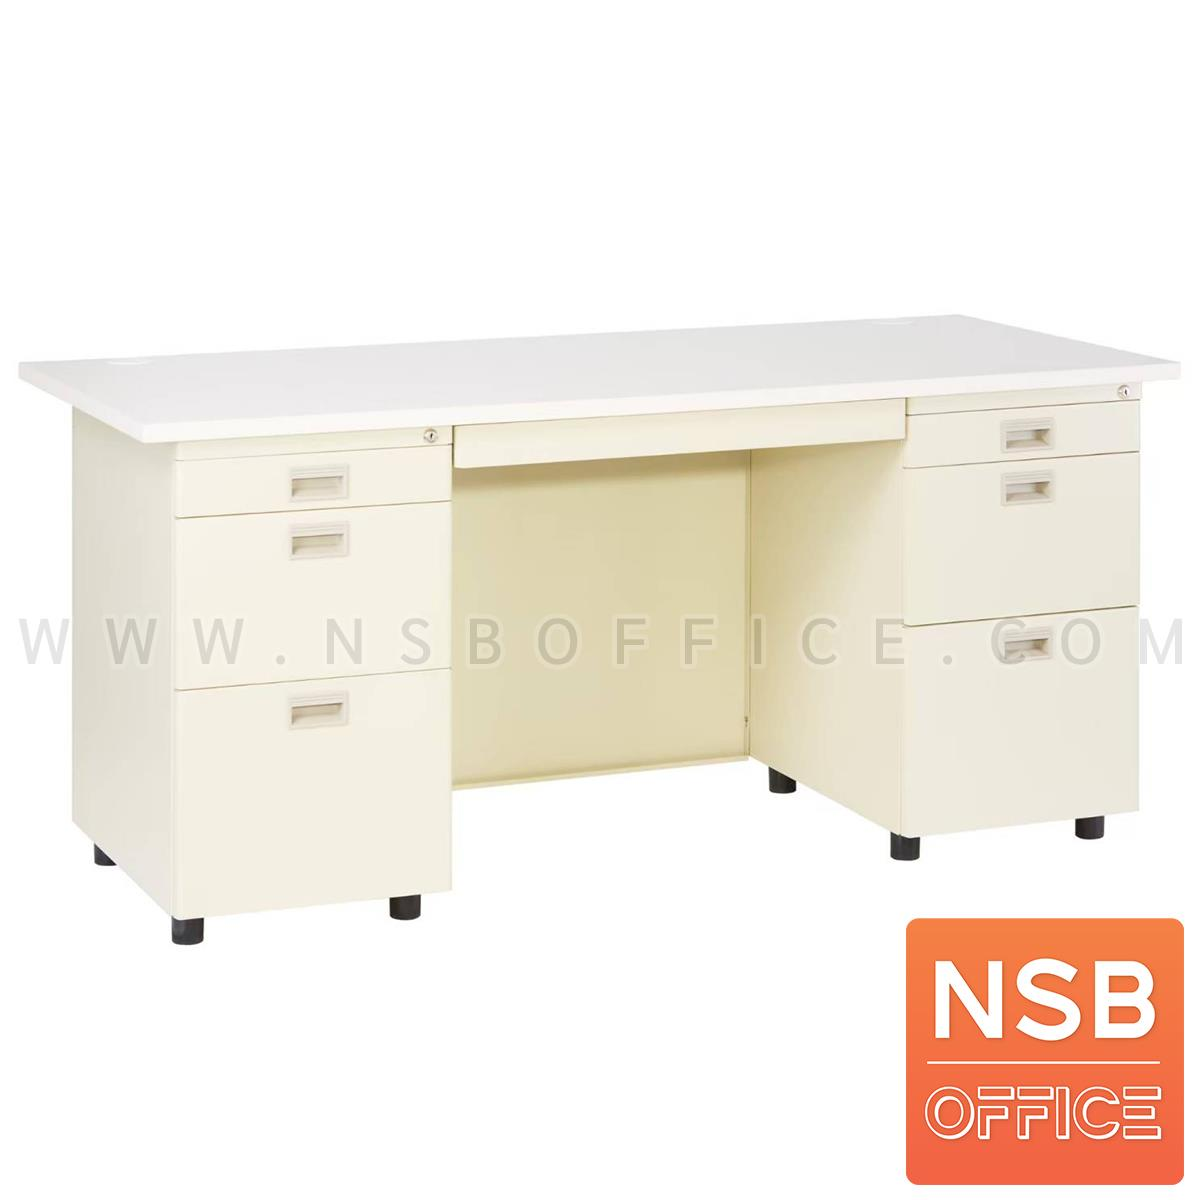 E06A020:โต๊ะทำงานเหล็กหน้าไม้ผิวพีวีซี 7 ลิ้นชัก  รุ่น DNP 167 ขนาด 160W*70D cm. เหล็กหนาพิเศษ 0.6 มม.